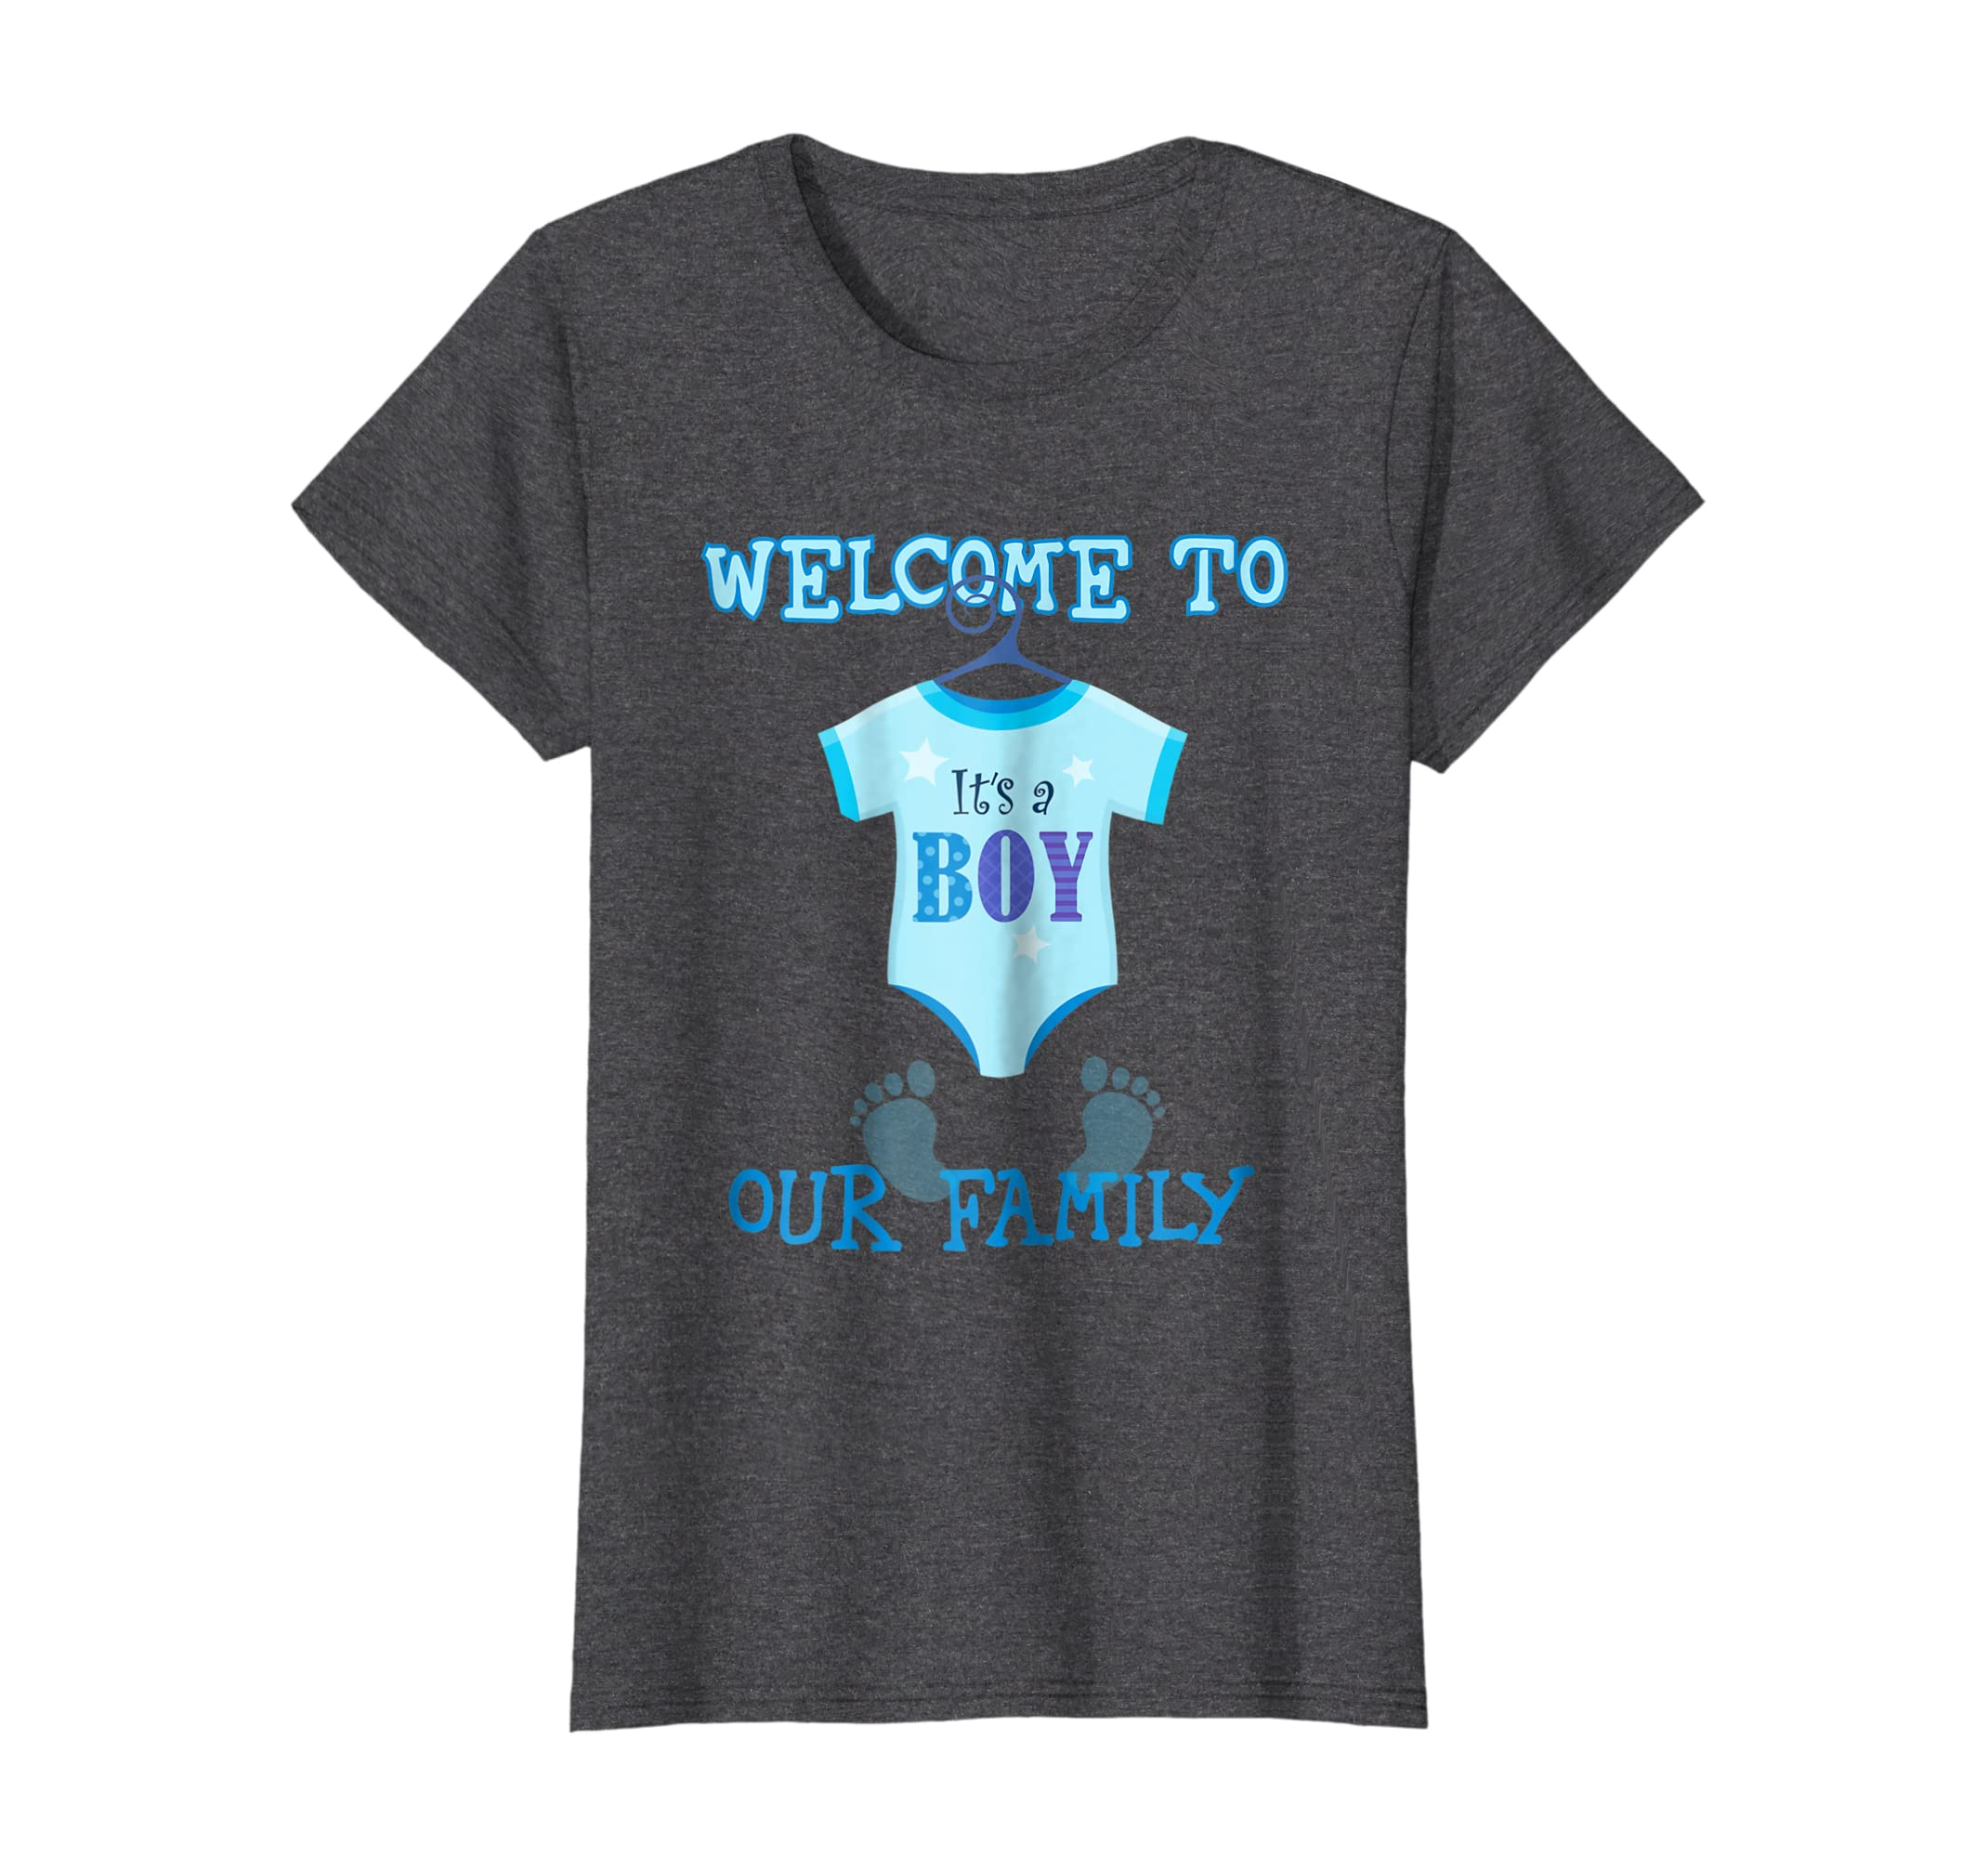 69fc4dceabb2d Amazon.com: It's A Boy t shirt,Baby Shower, party tshirt ,new baby shirt:  Clothing